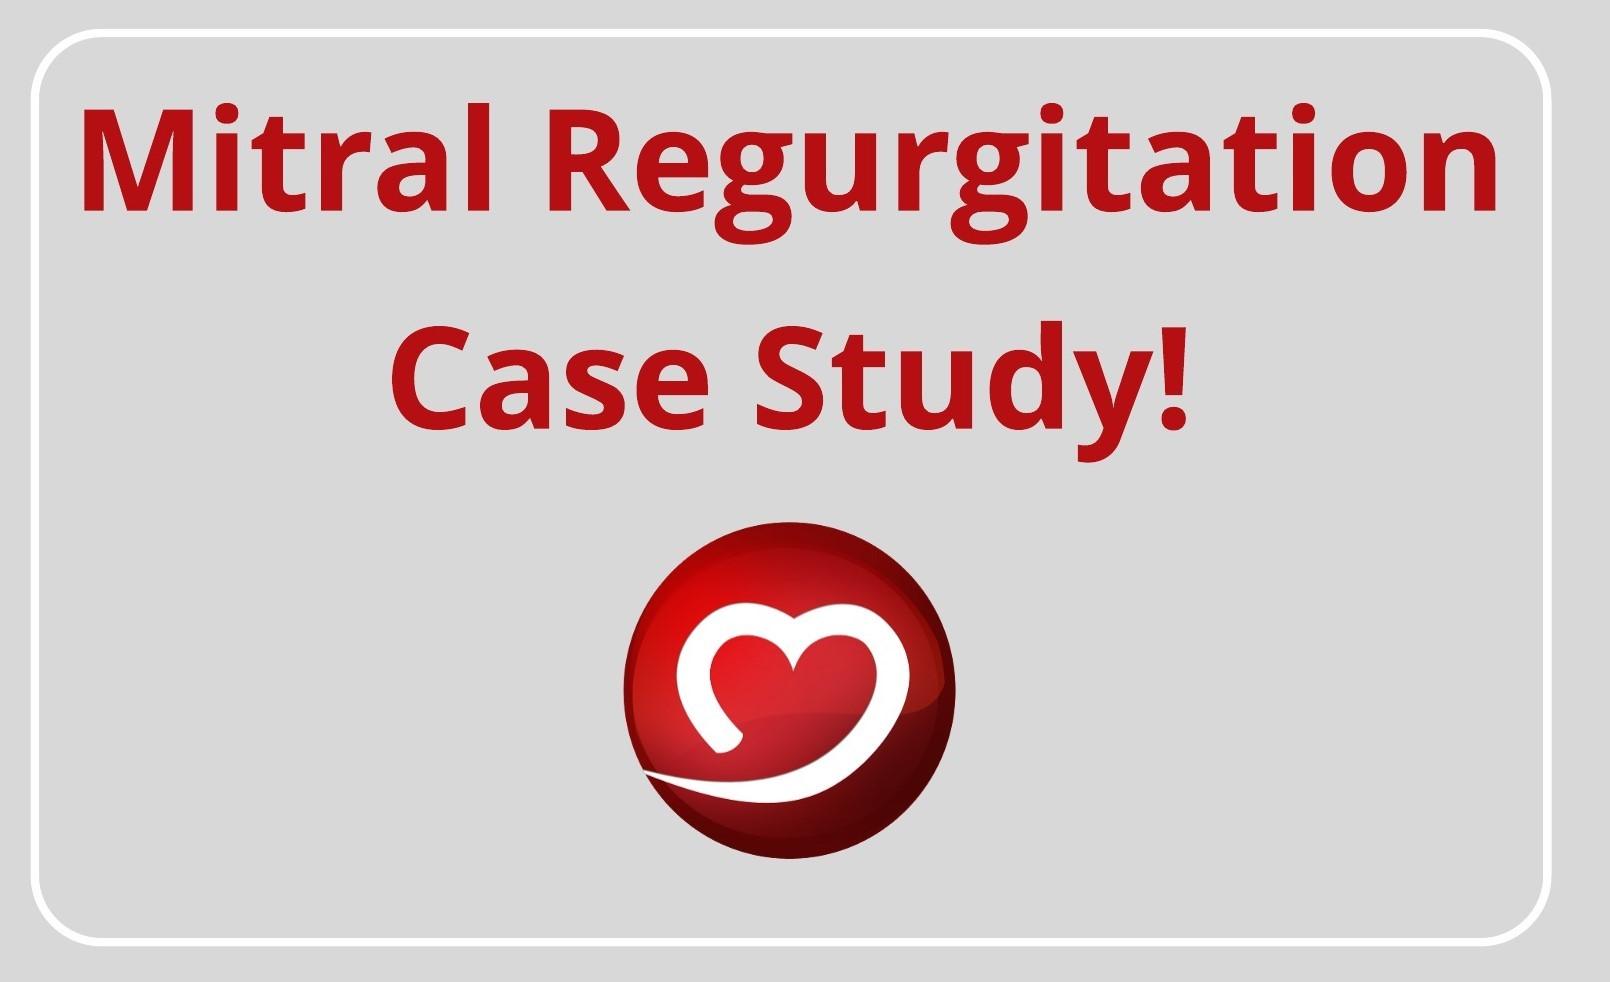 Mitral Regurgitation Case Study!